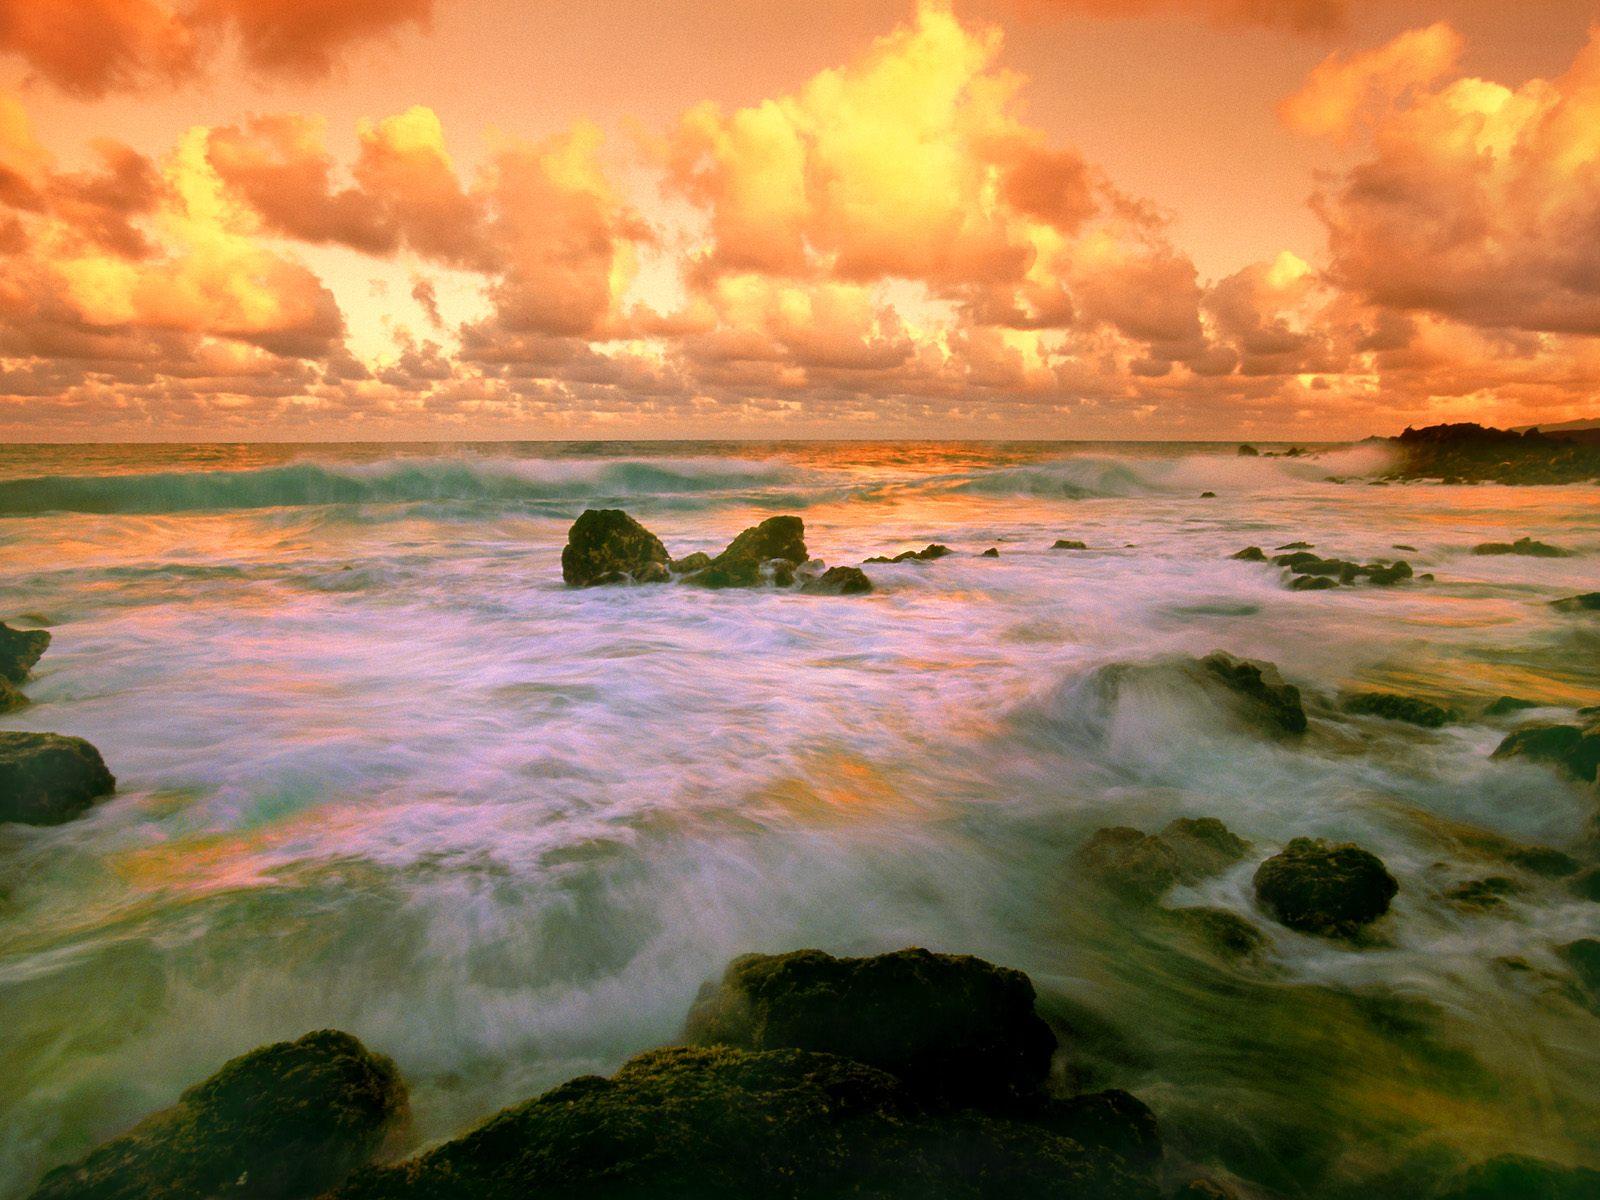 берег, камни, море